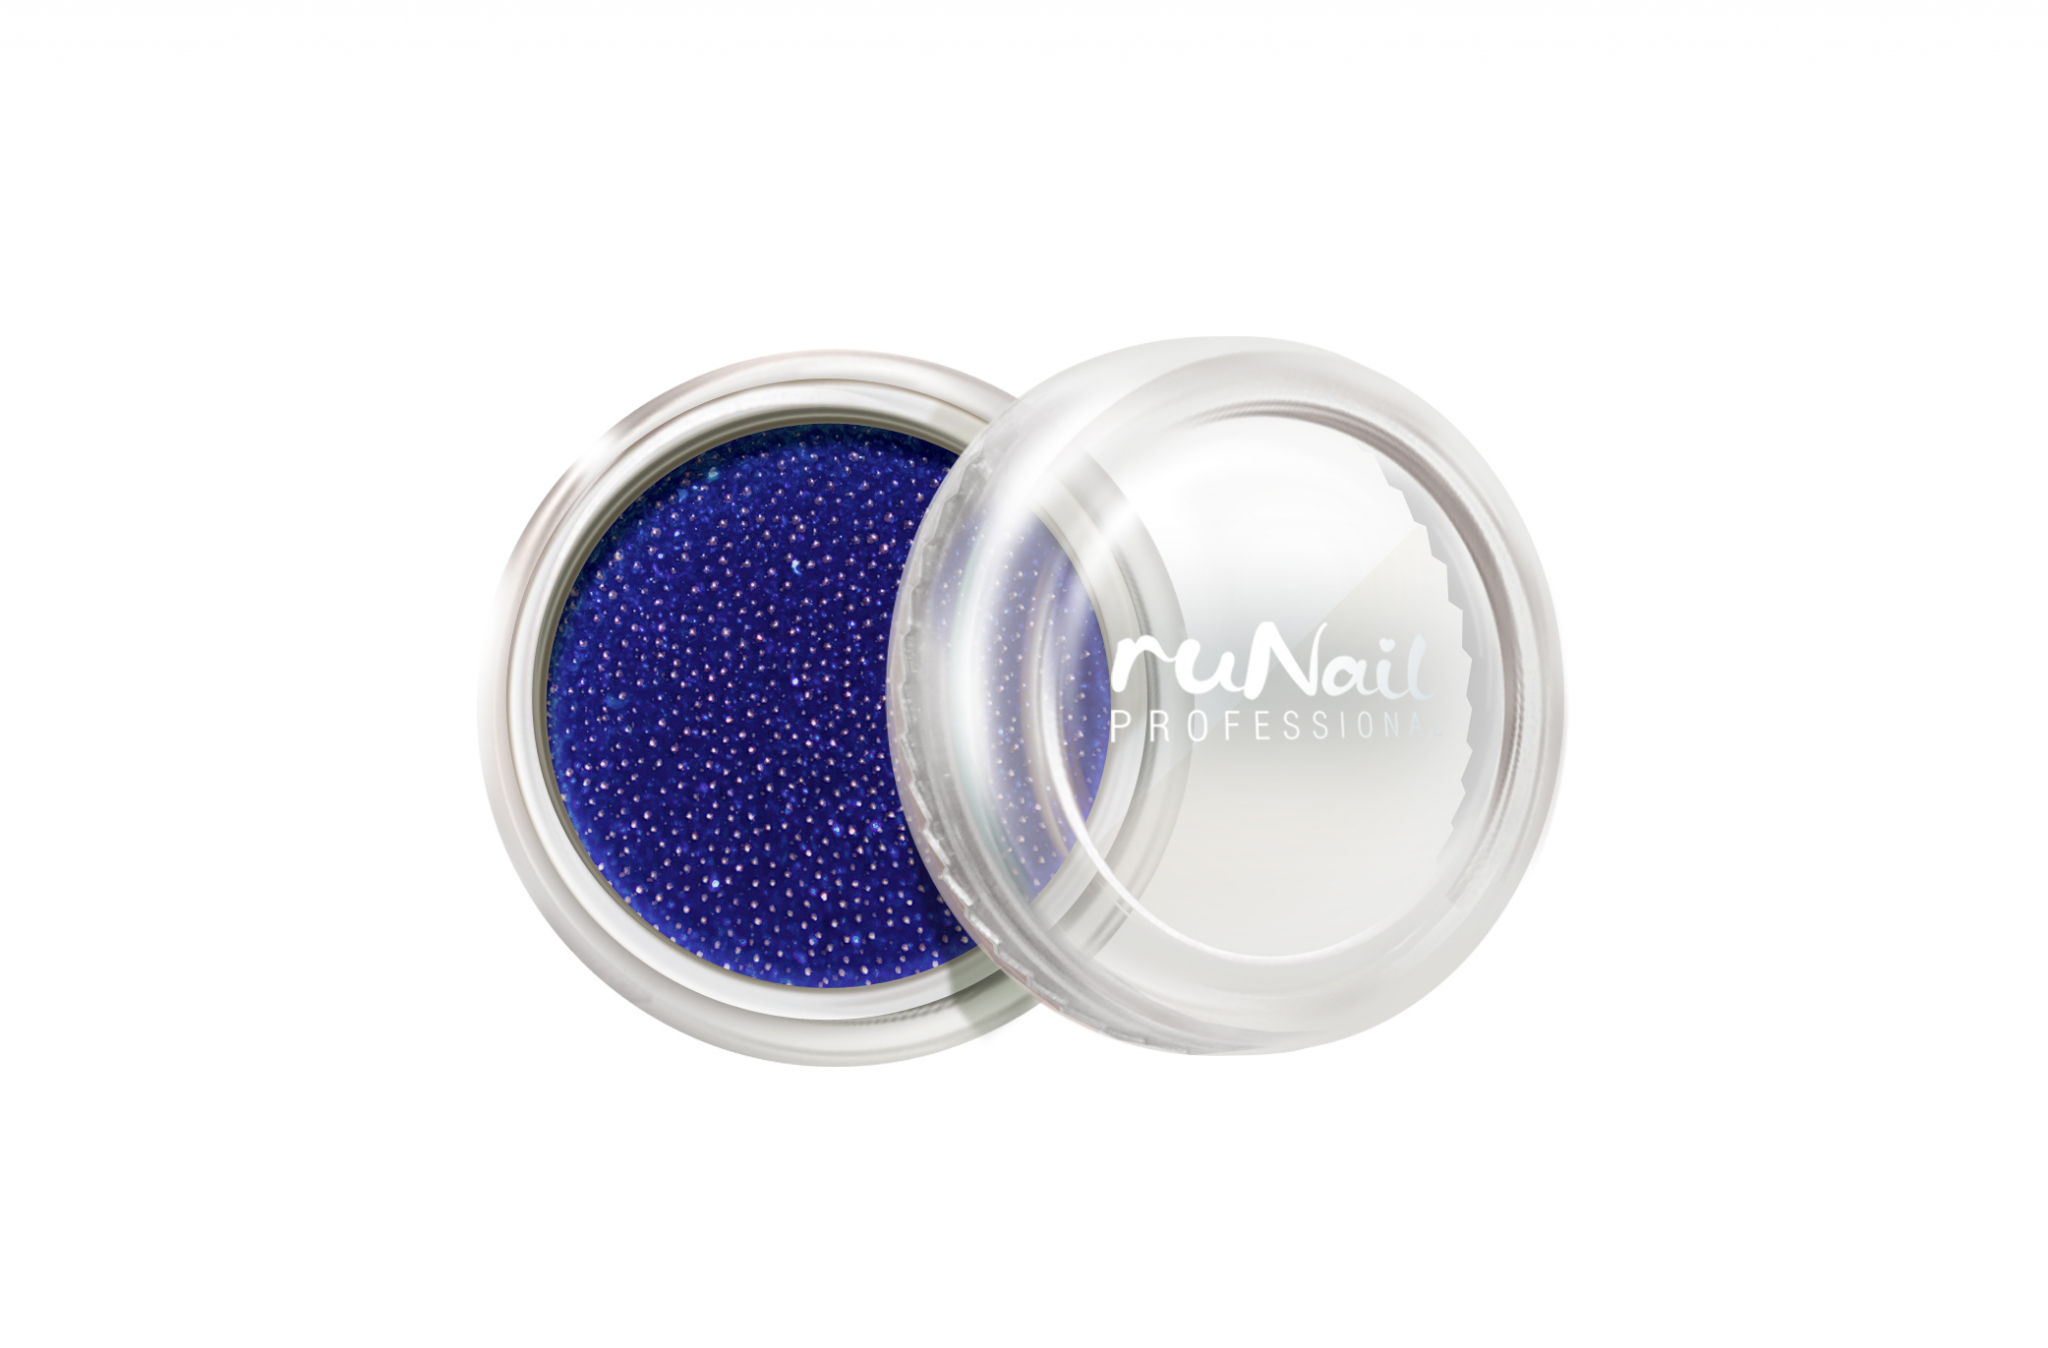 Дизайн для ногтей: бульонки (цвет: темно-синий) № 0306